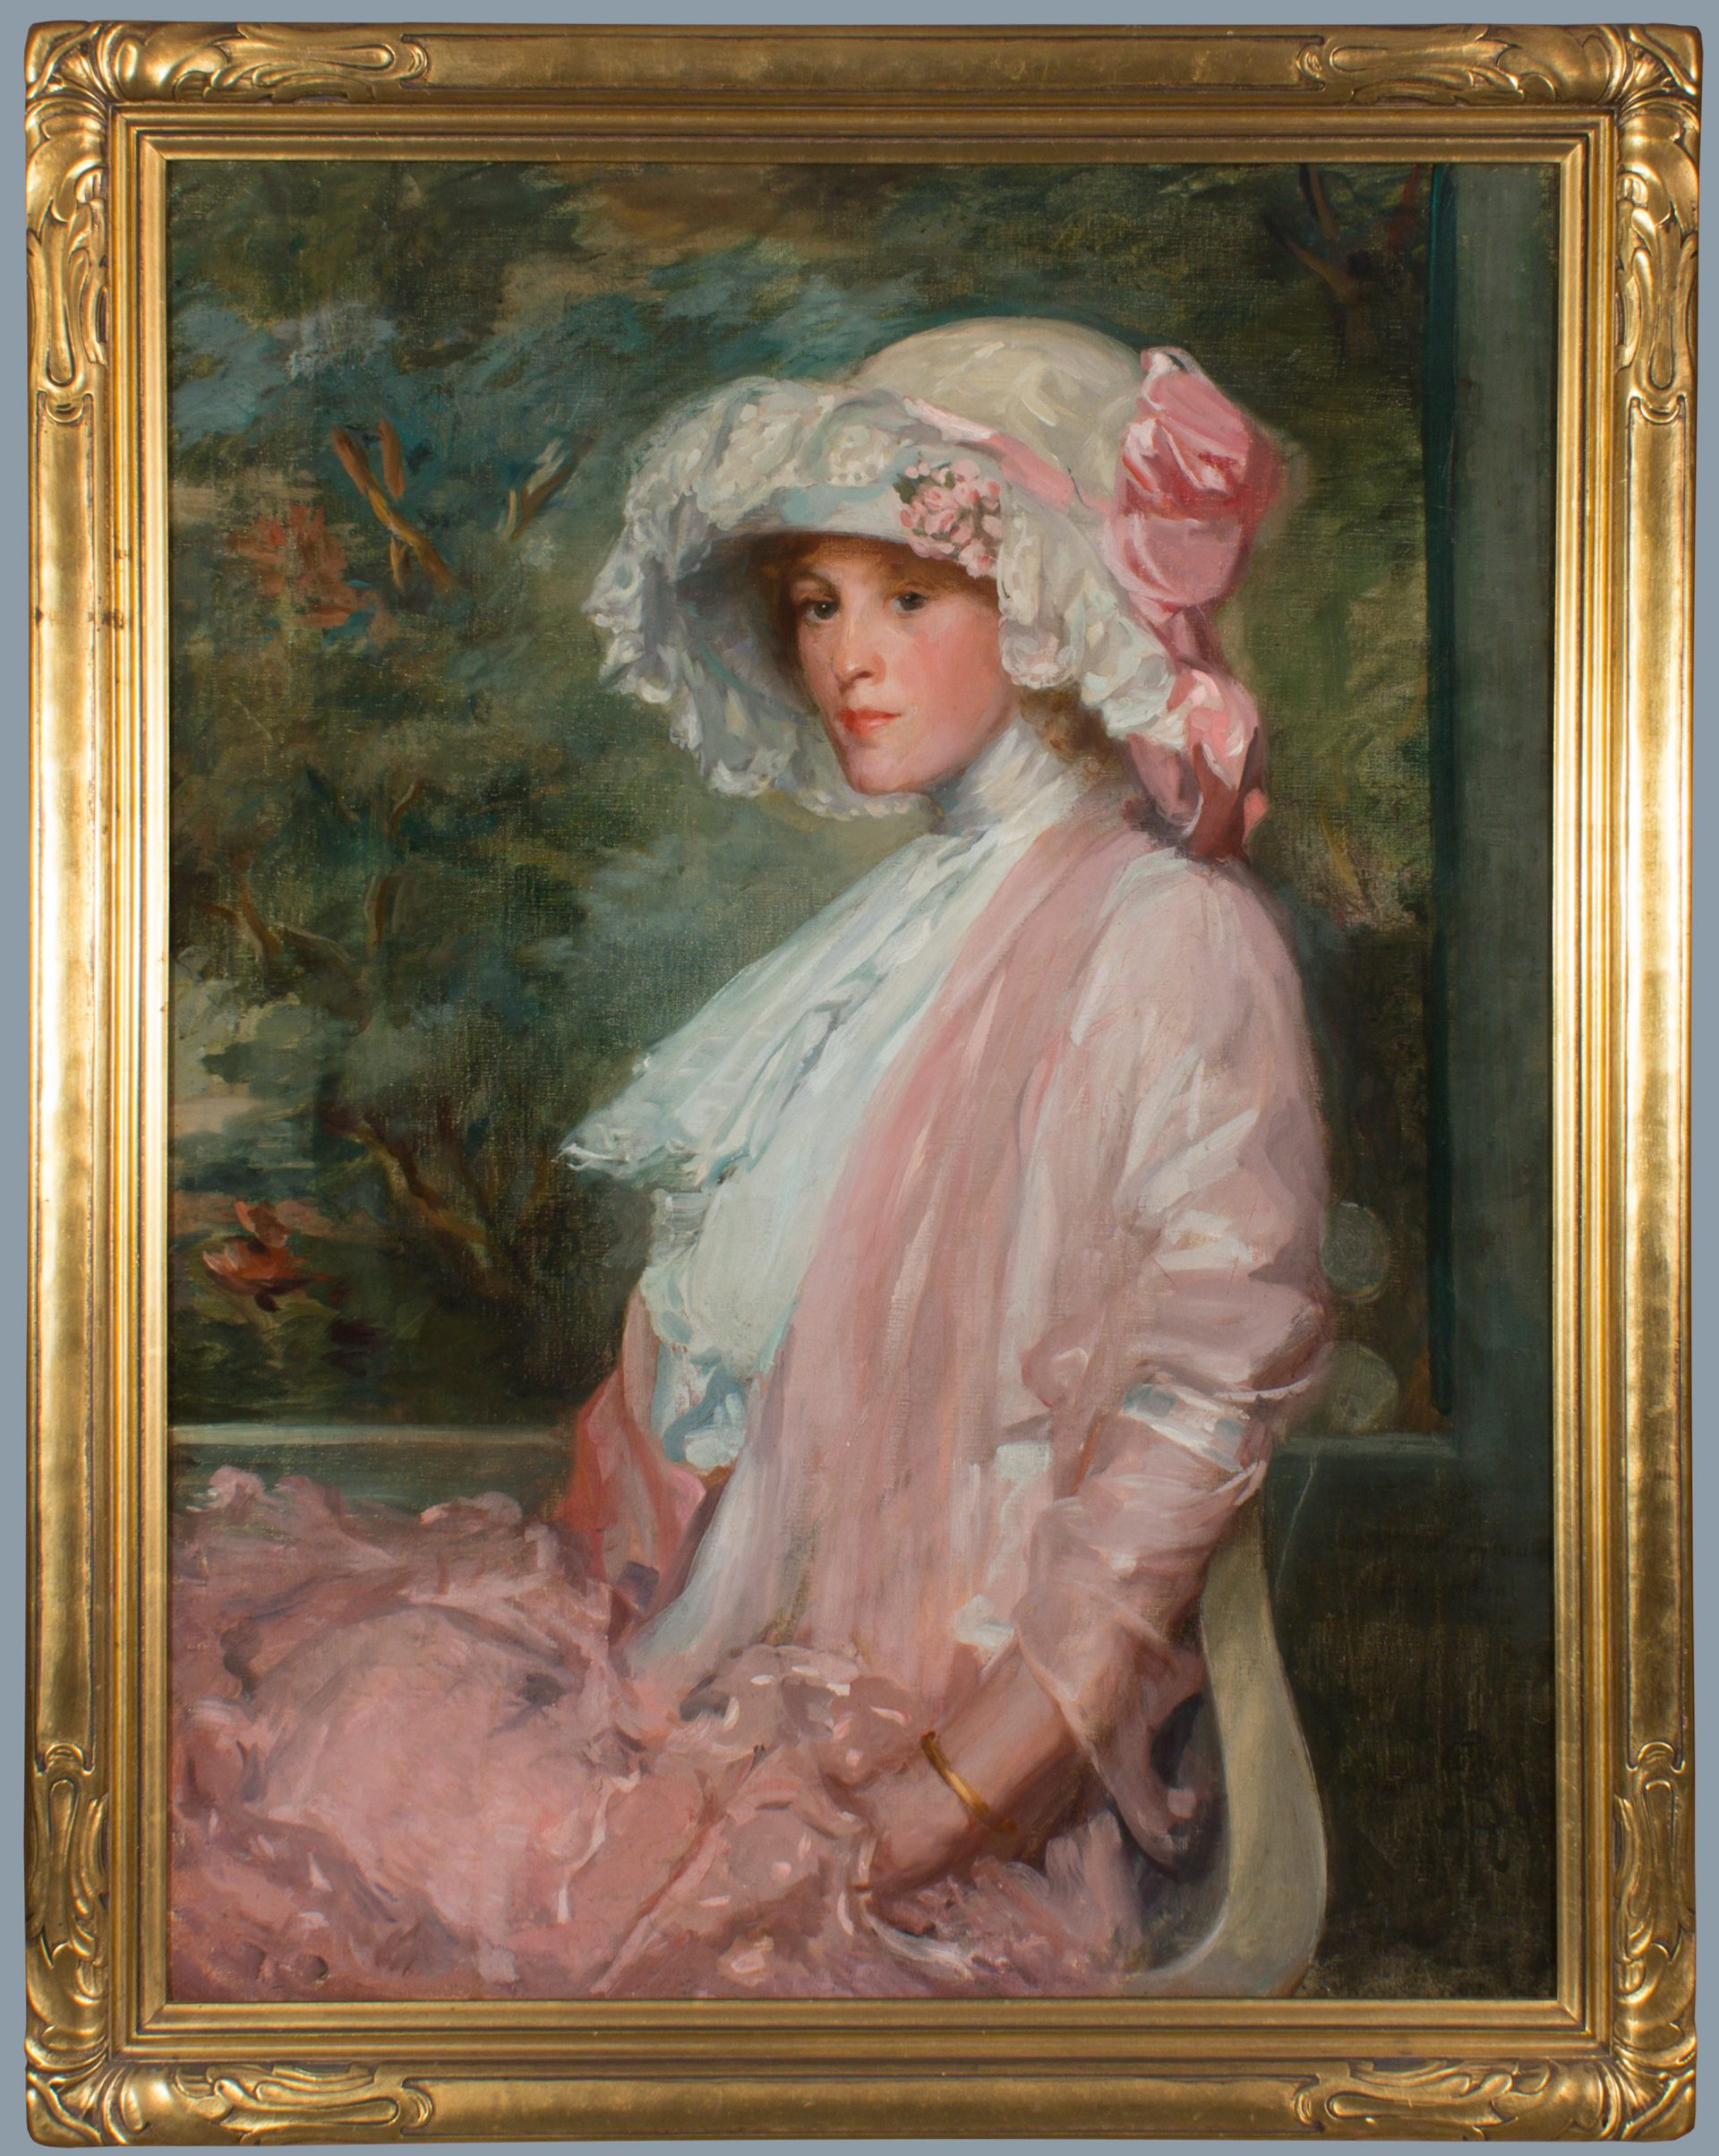 Study in Pink: Mercedes Walton (FRAMED)